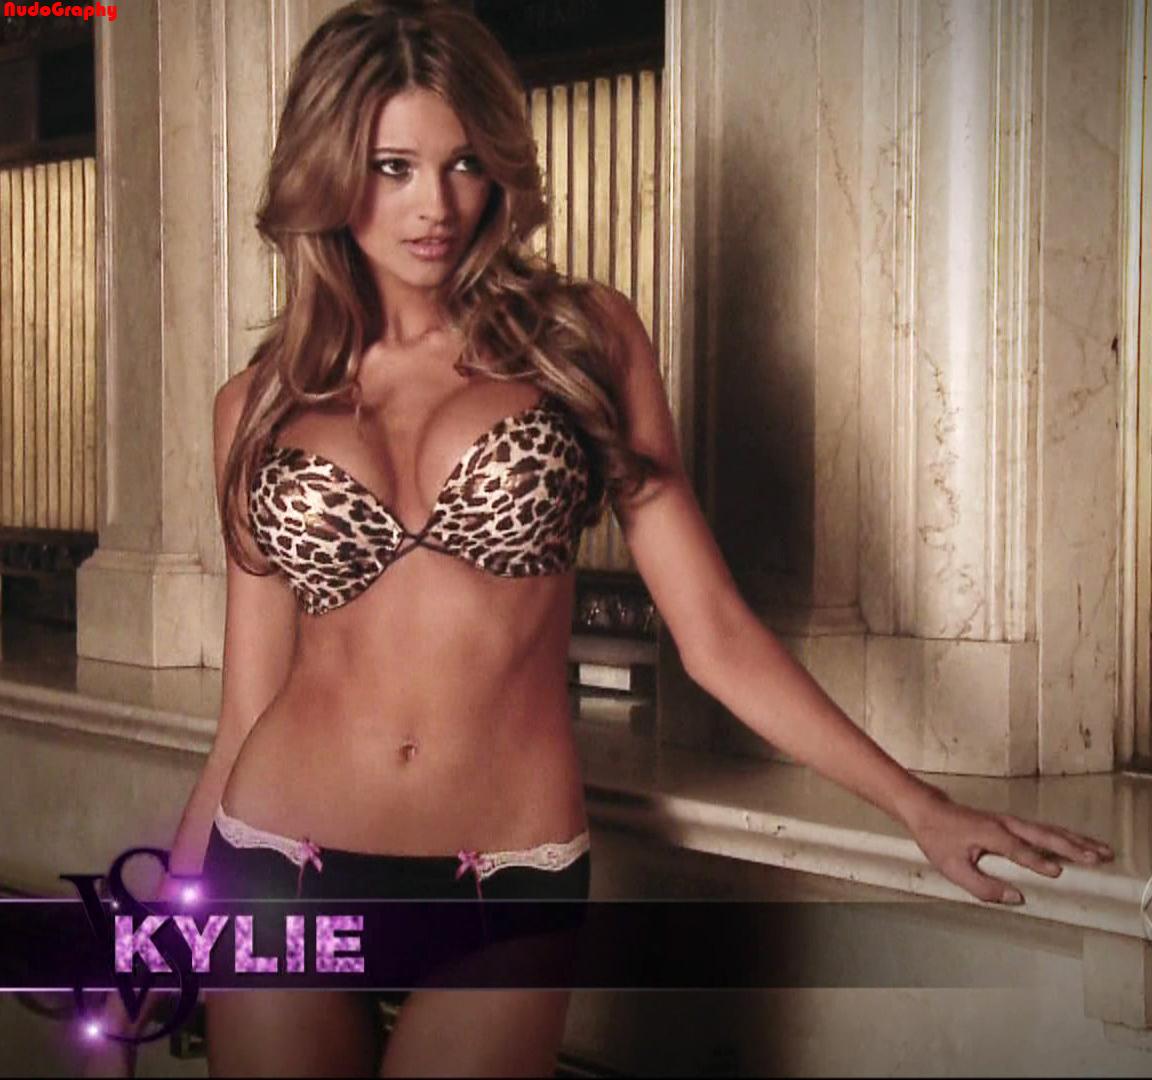 Kylie bisutti nude pics